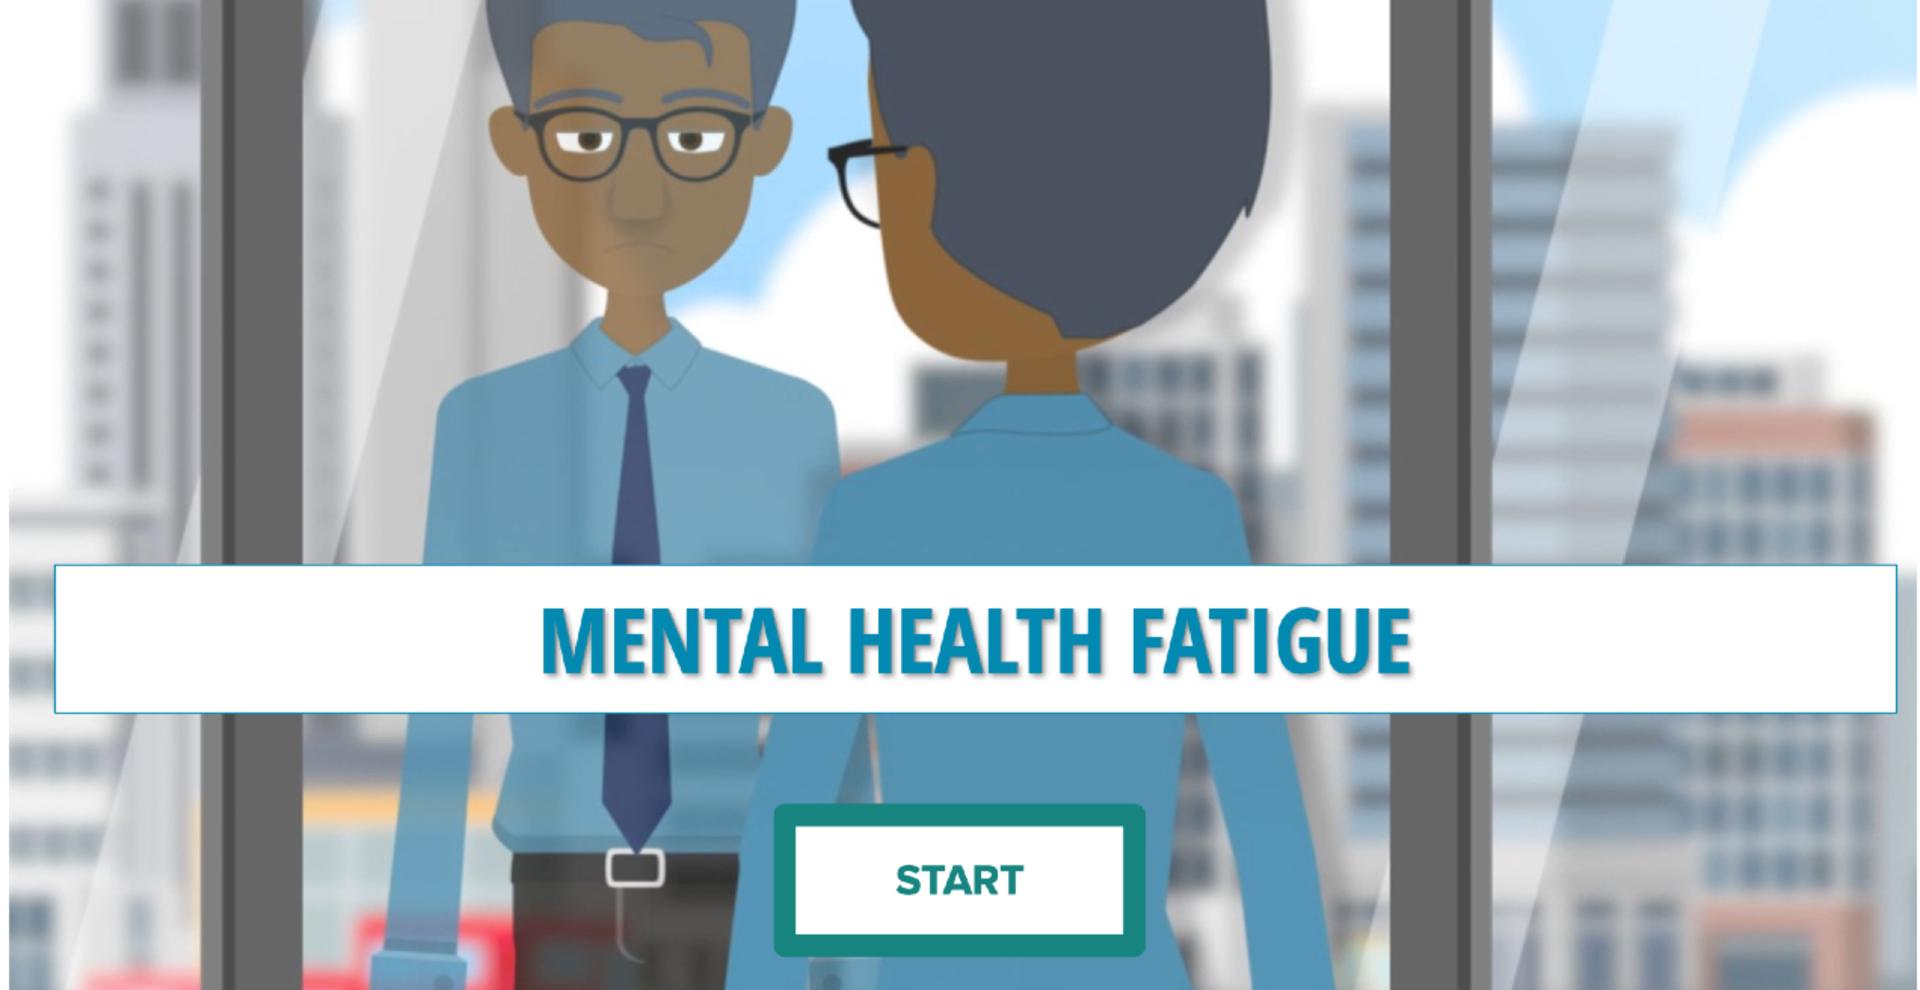 Mental Health Fatigue